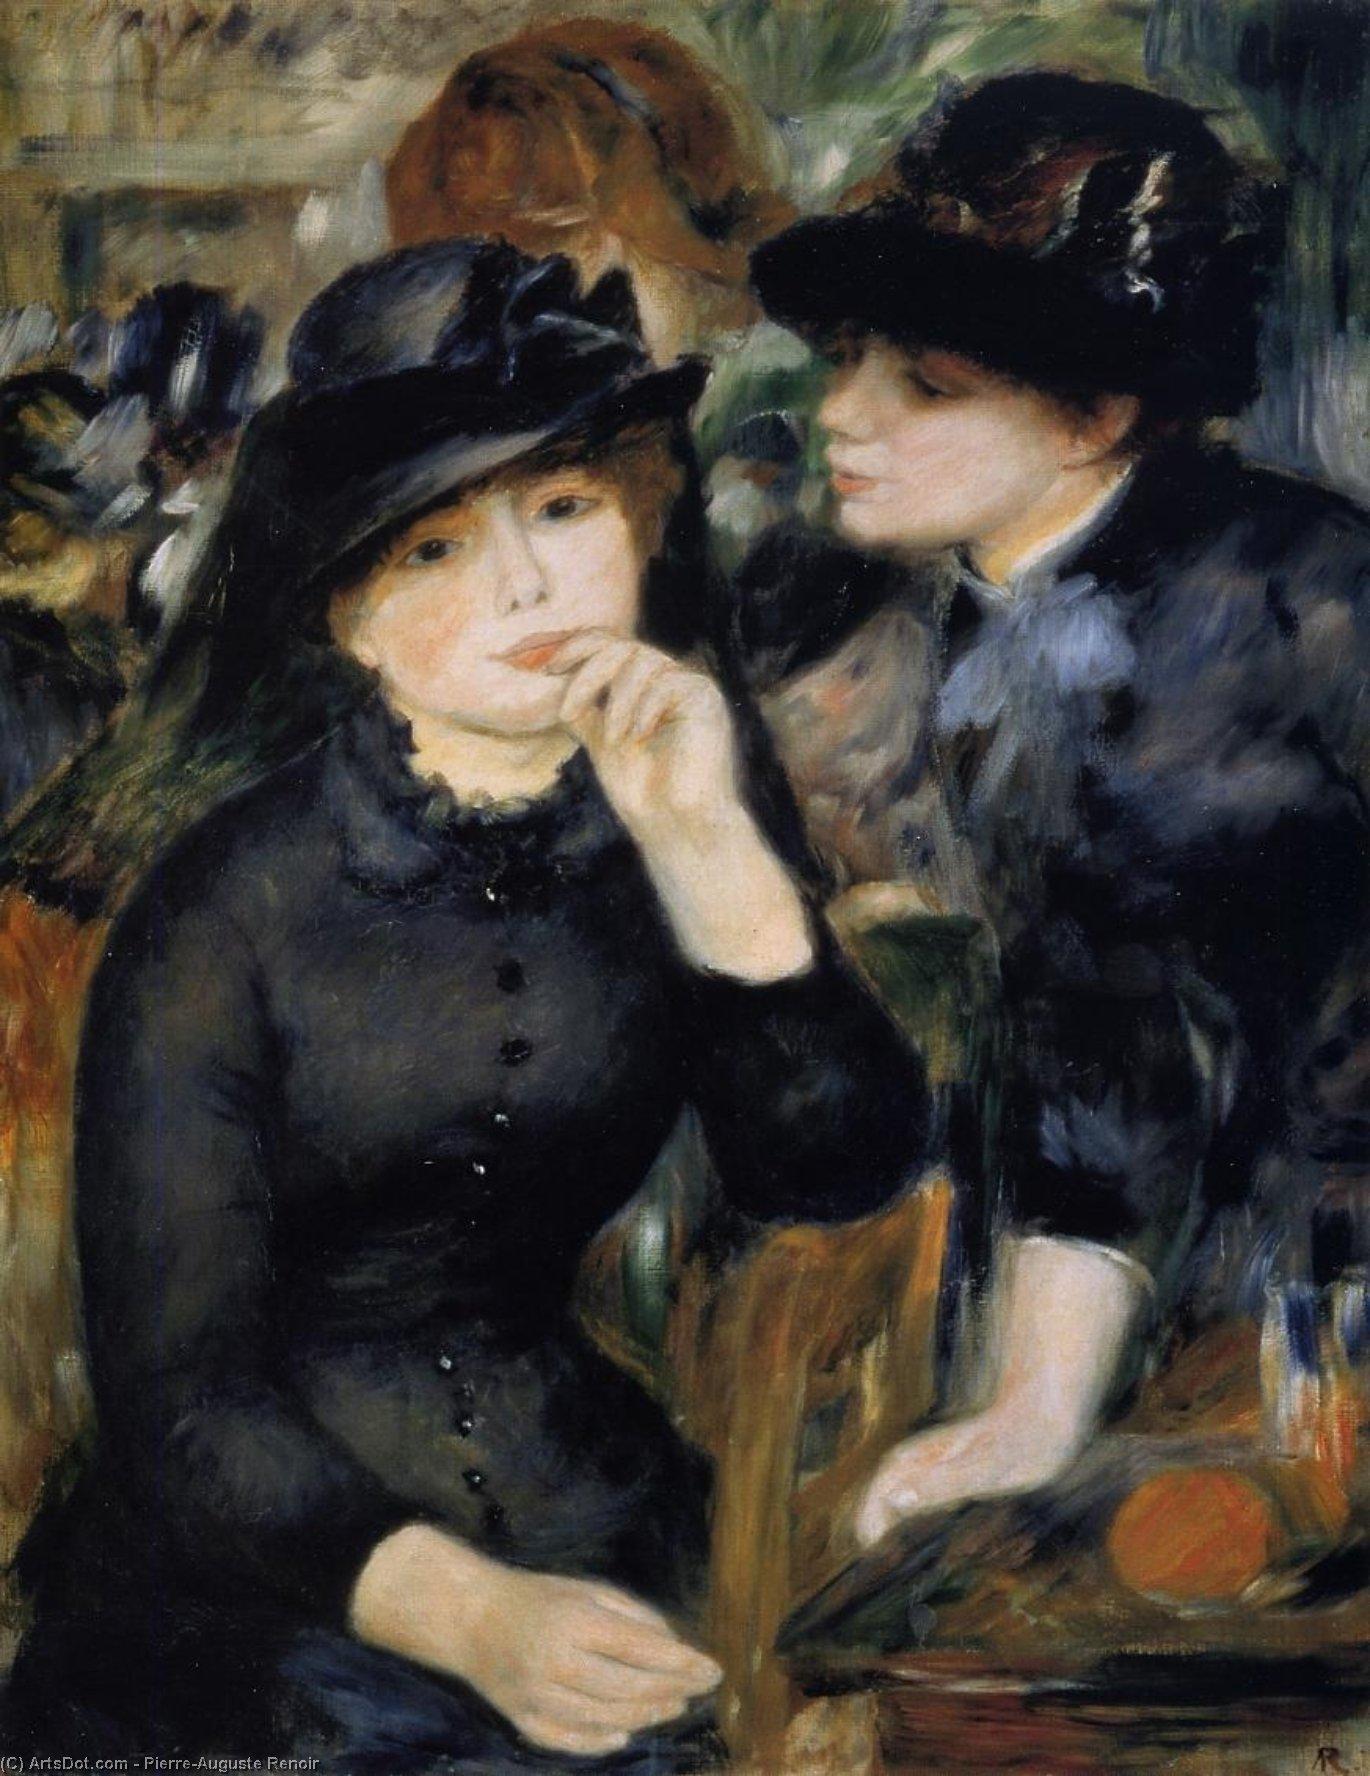 Wikioo.org - The Encyclopedia of Fine Arts - Painting, Artwork by Pierre-Auguste Renoir - Girls in Black